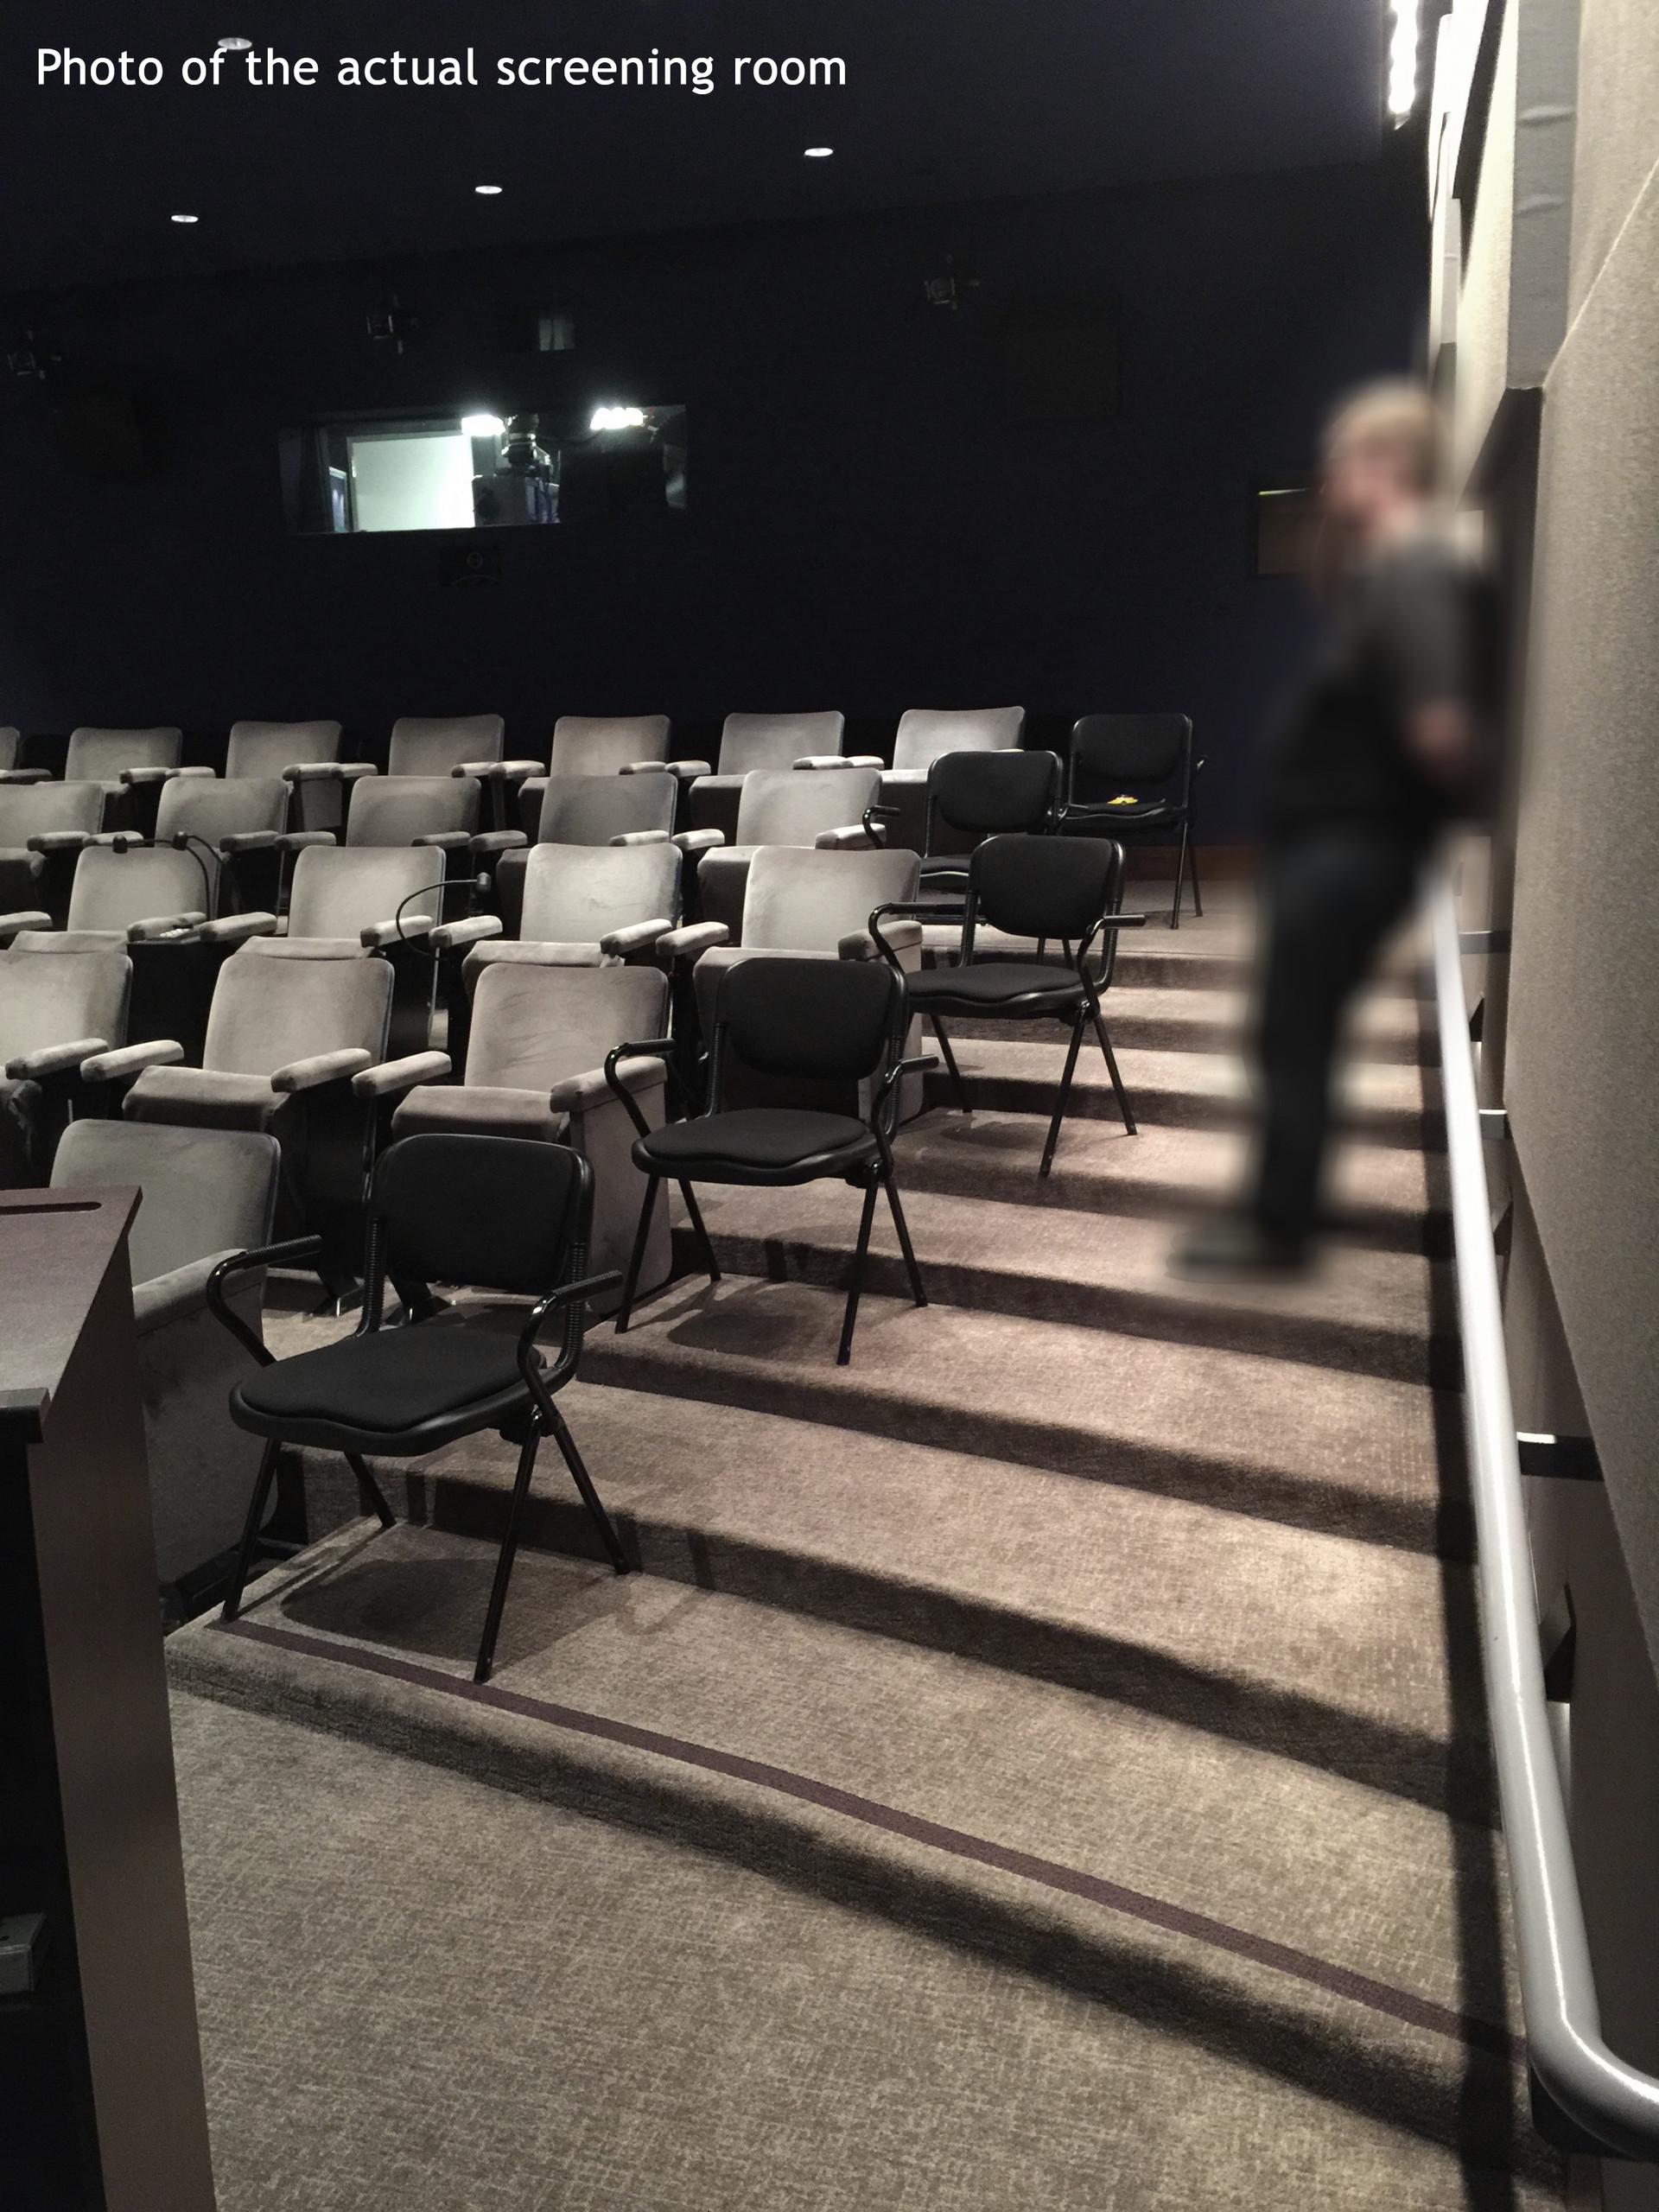 Actual Screening Room | Theater